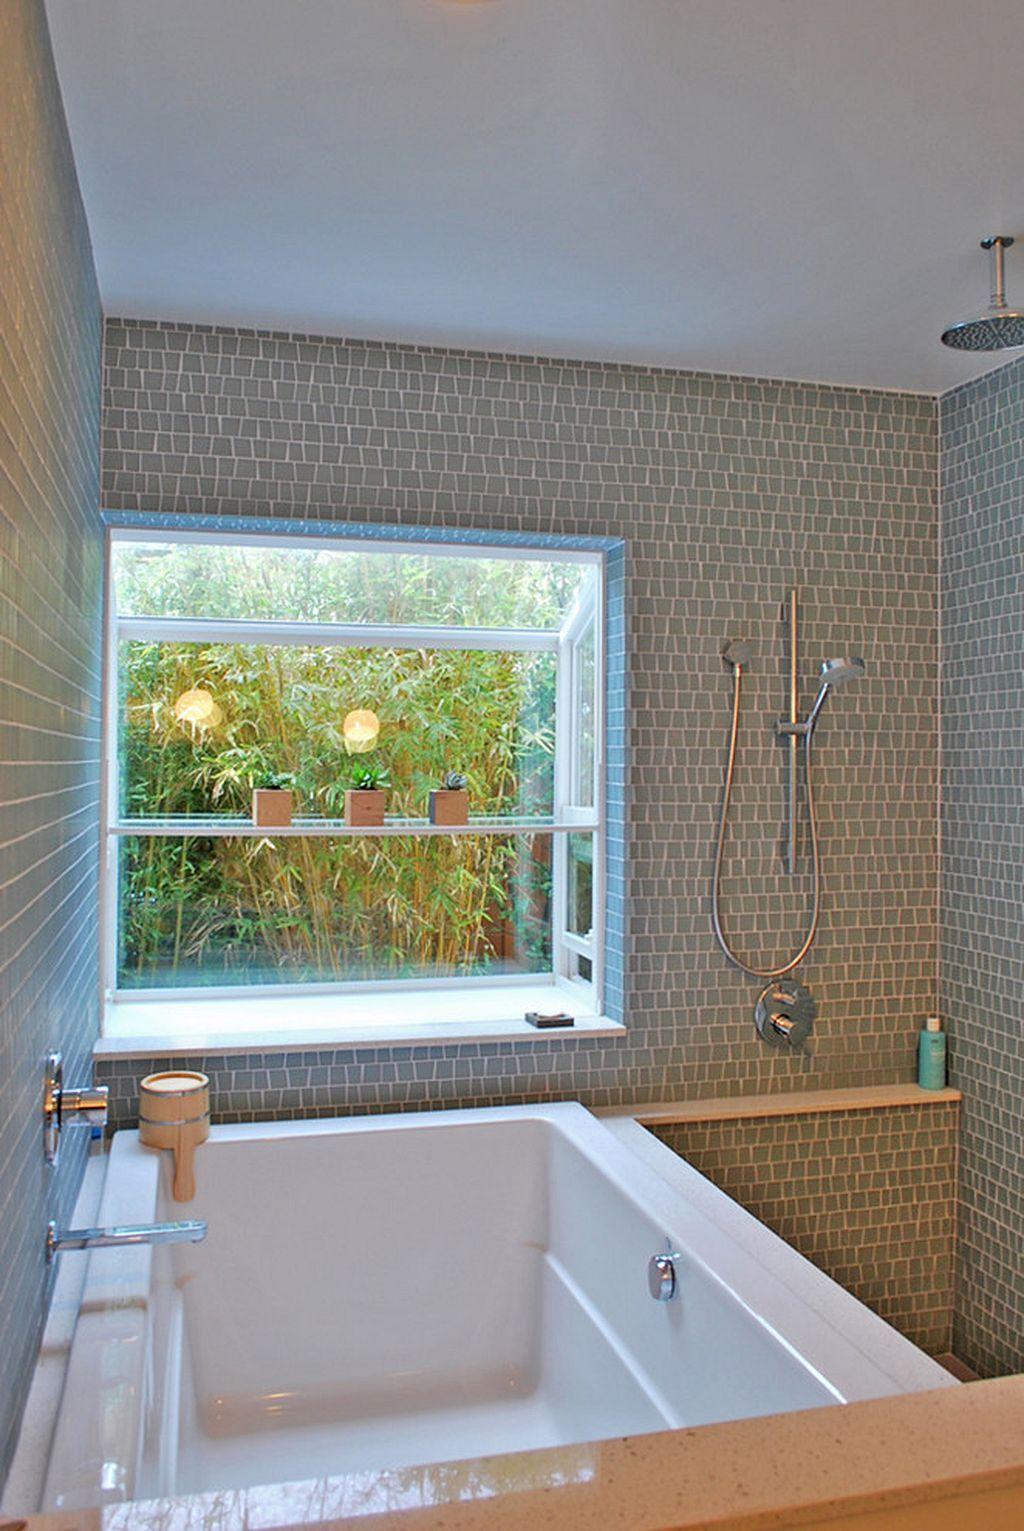 Tiny Bathroom Tub Shower Combo Remodeling Ideas | Tiny bathrooms ...